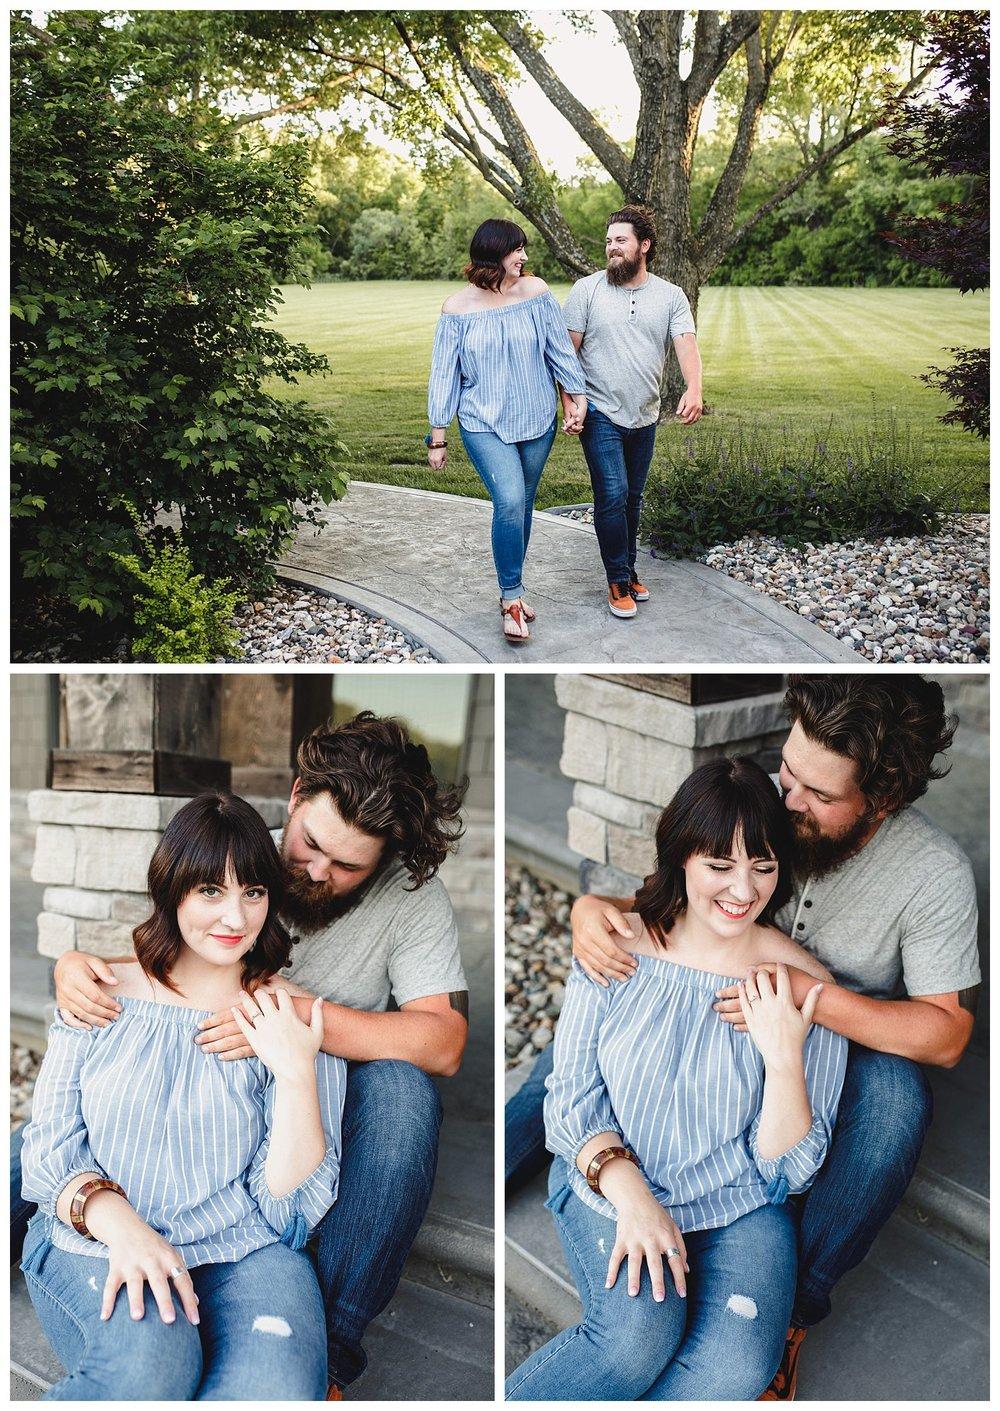 Kelsey_Diane_Photography_Kansas_City_Engagement_Wedding_Photographer_Midwest_Traveling_Missouri_Chris_Taylor_0774.jpg